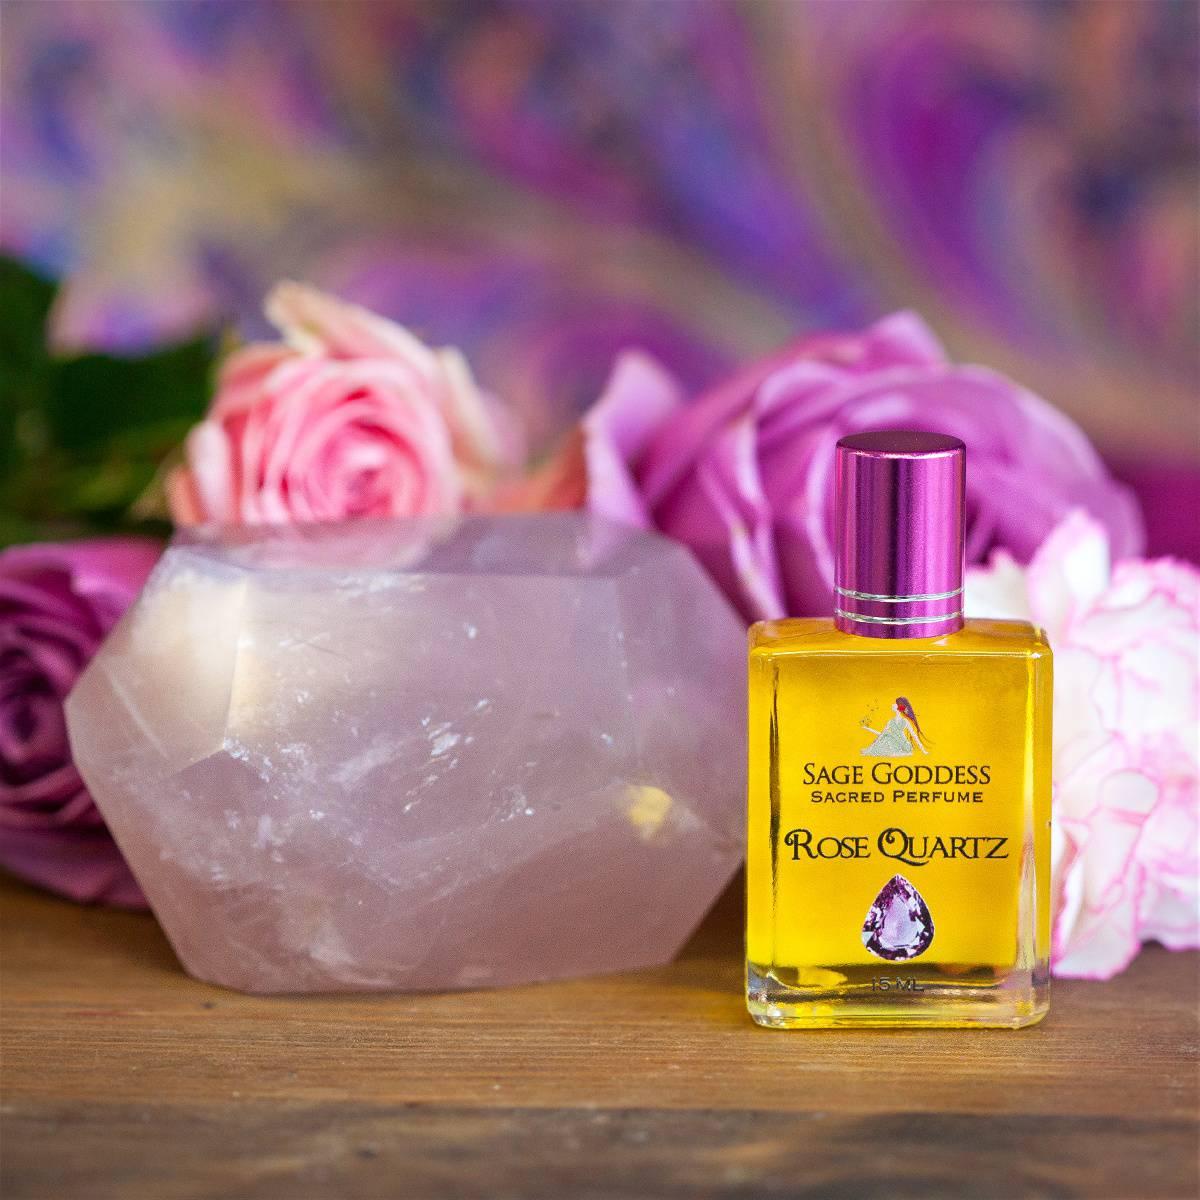 Gemmy Faceted Rose Quartz Power Stone with free Rose Quartz Perfume 5_8